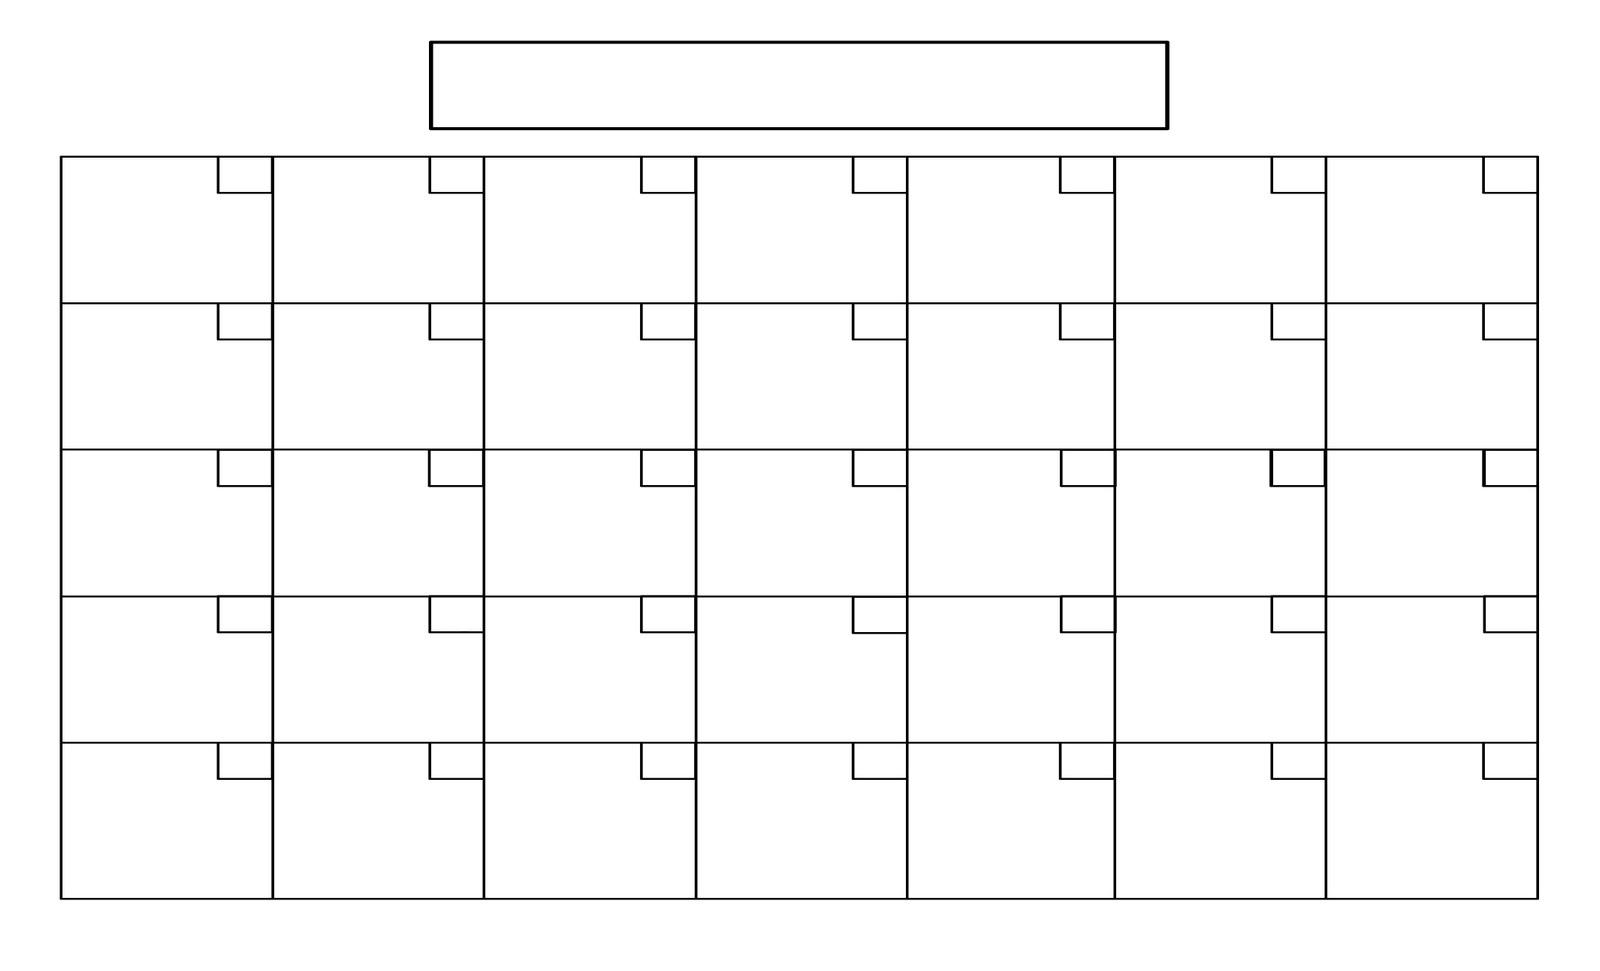 Take Printable Blank 31 Day Calendar ⋆ The Best Printable